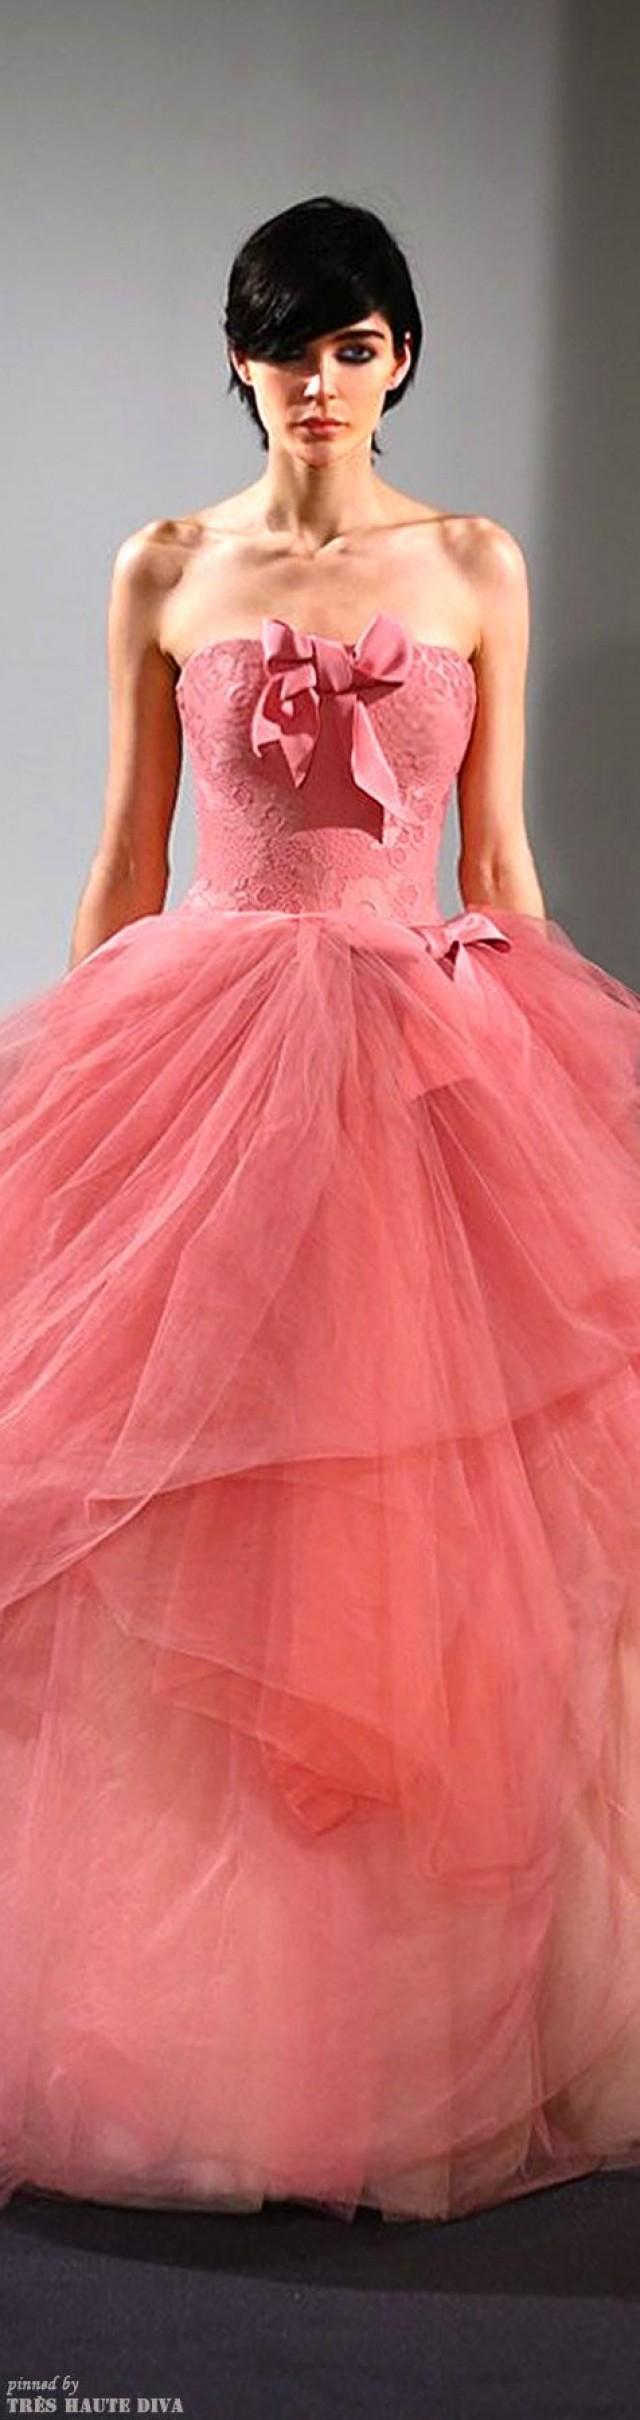 Vera Wang, wedding dress